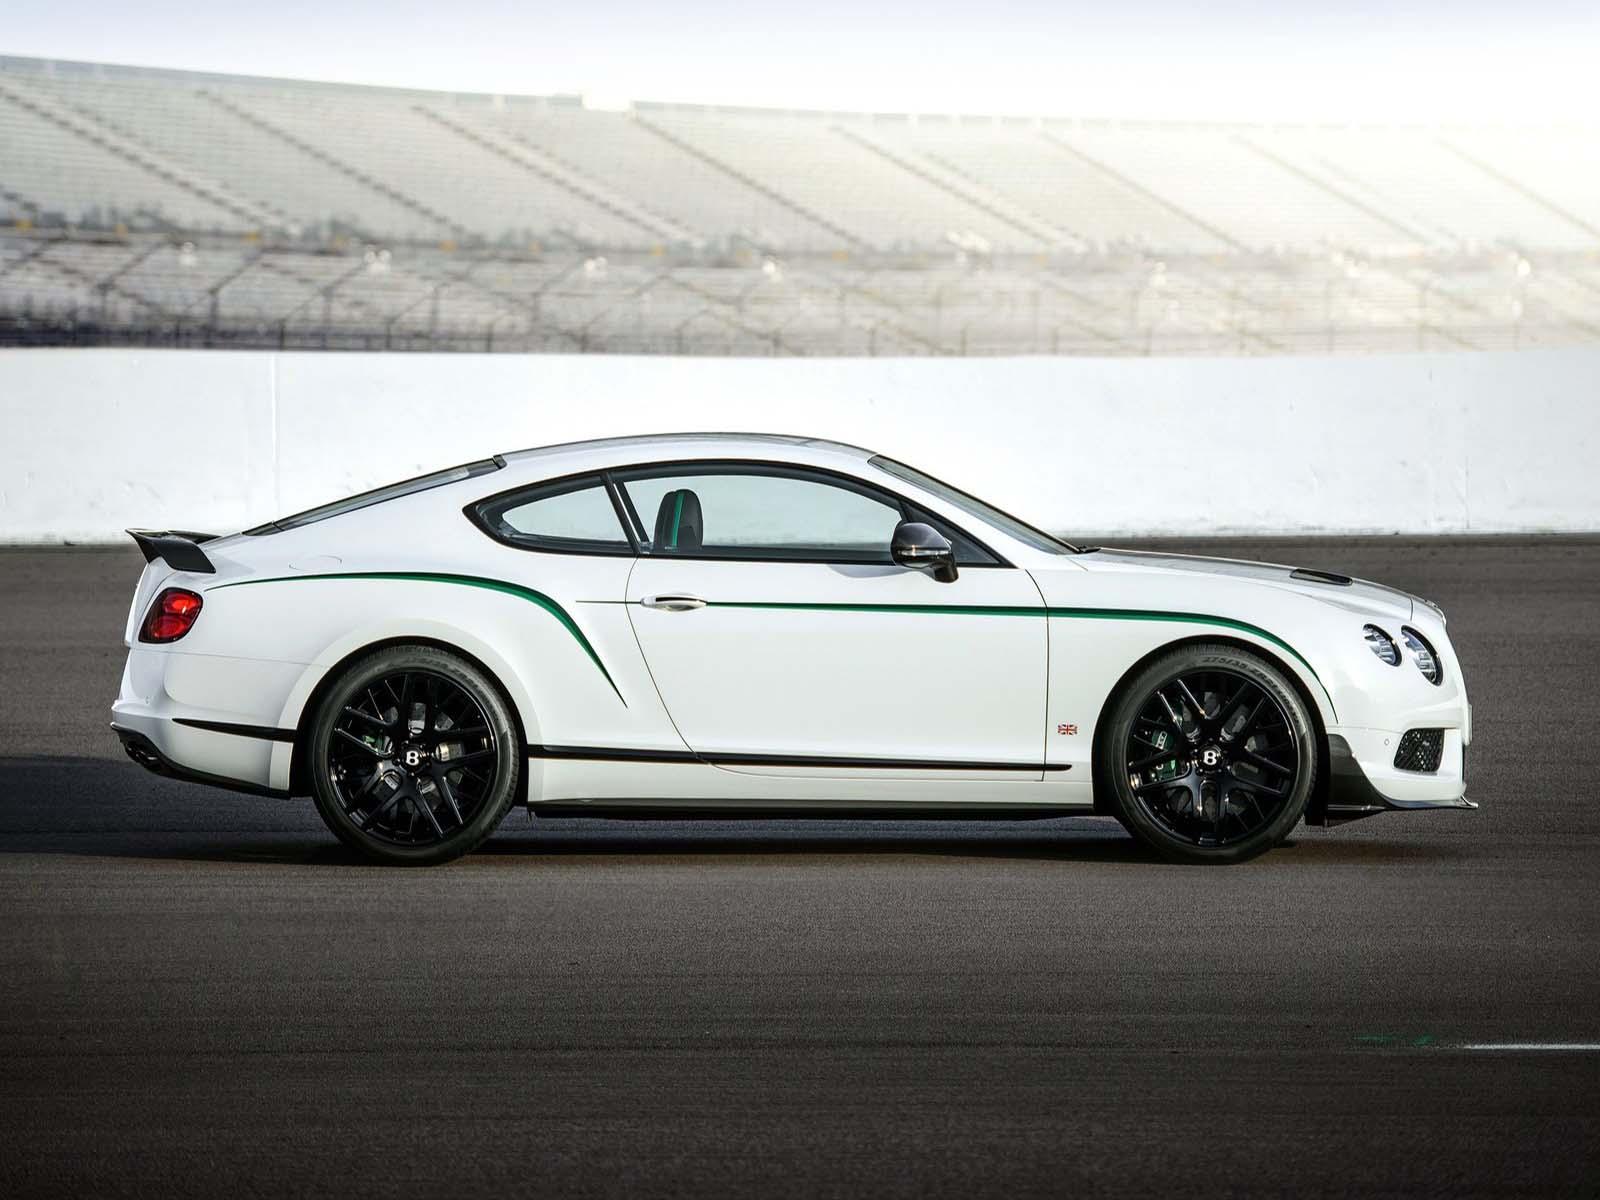 Bentley-Continental-GT-Free-Car-wallpaper-wp422706-1